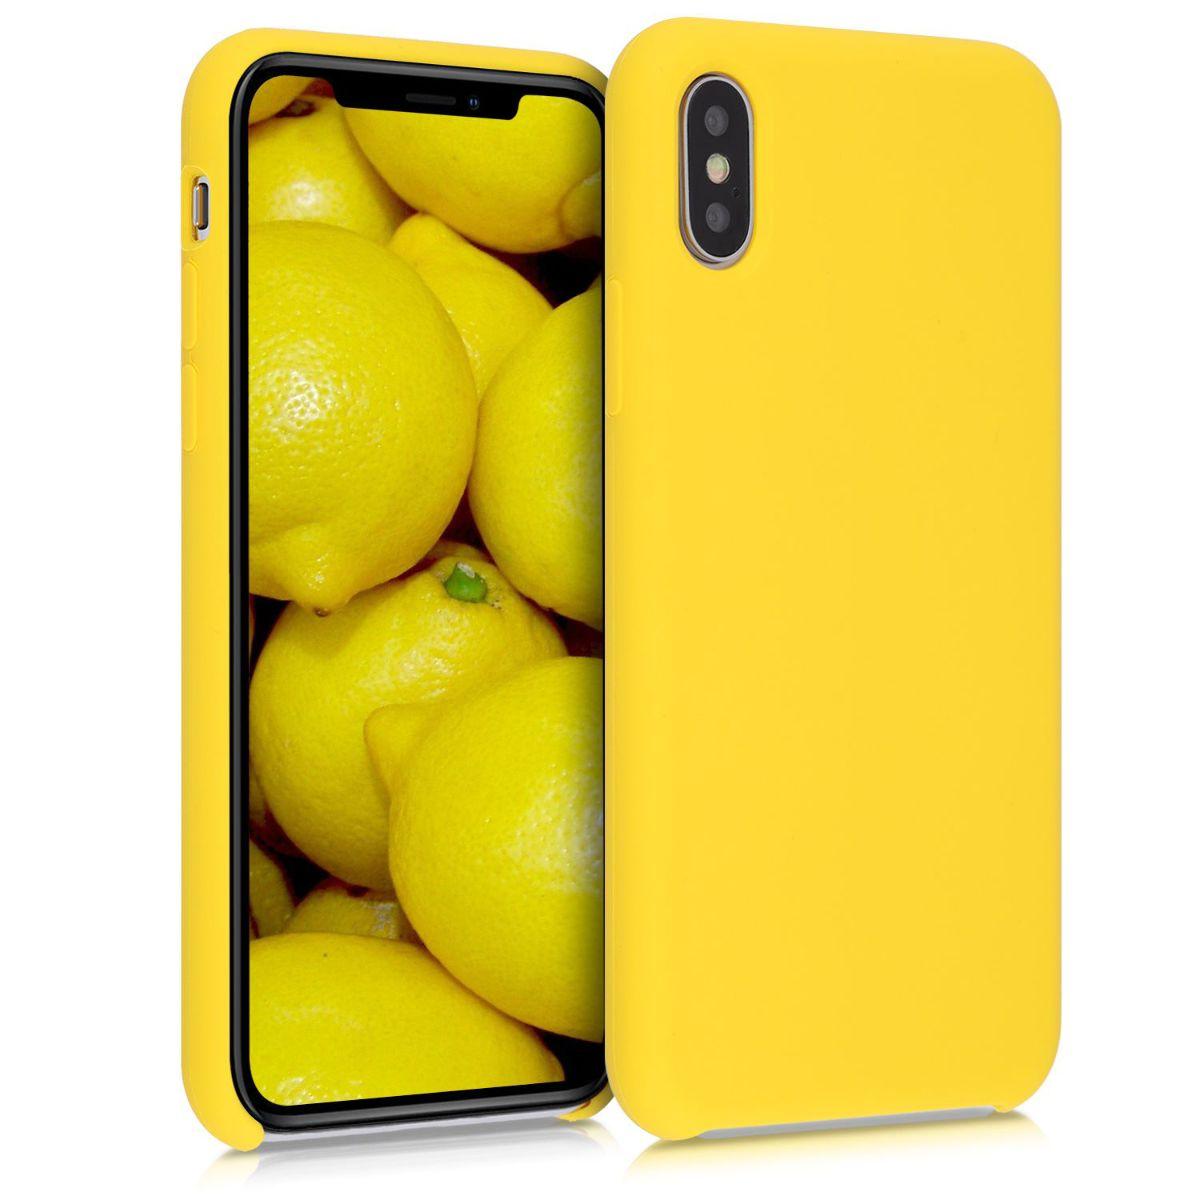 Kvalitní silikonové TPU pouzdro pro Apple iPhone XS - Vibrant Yellow